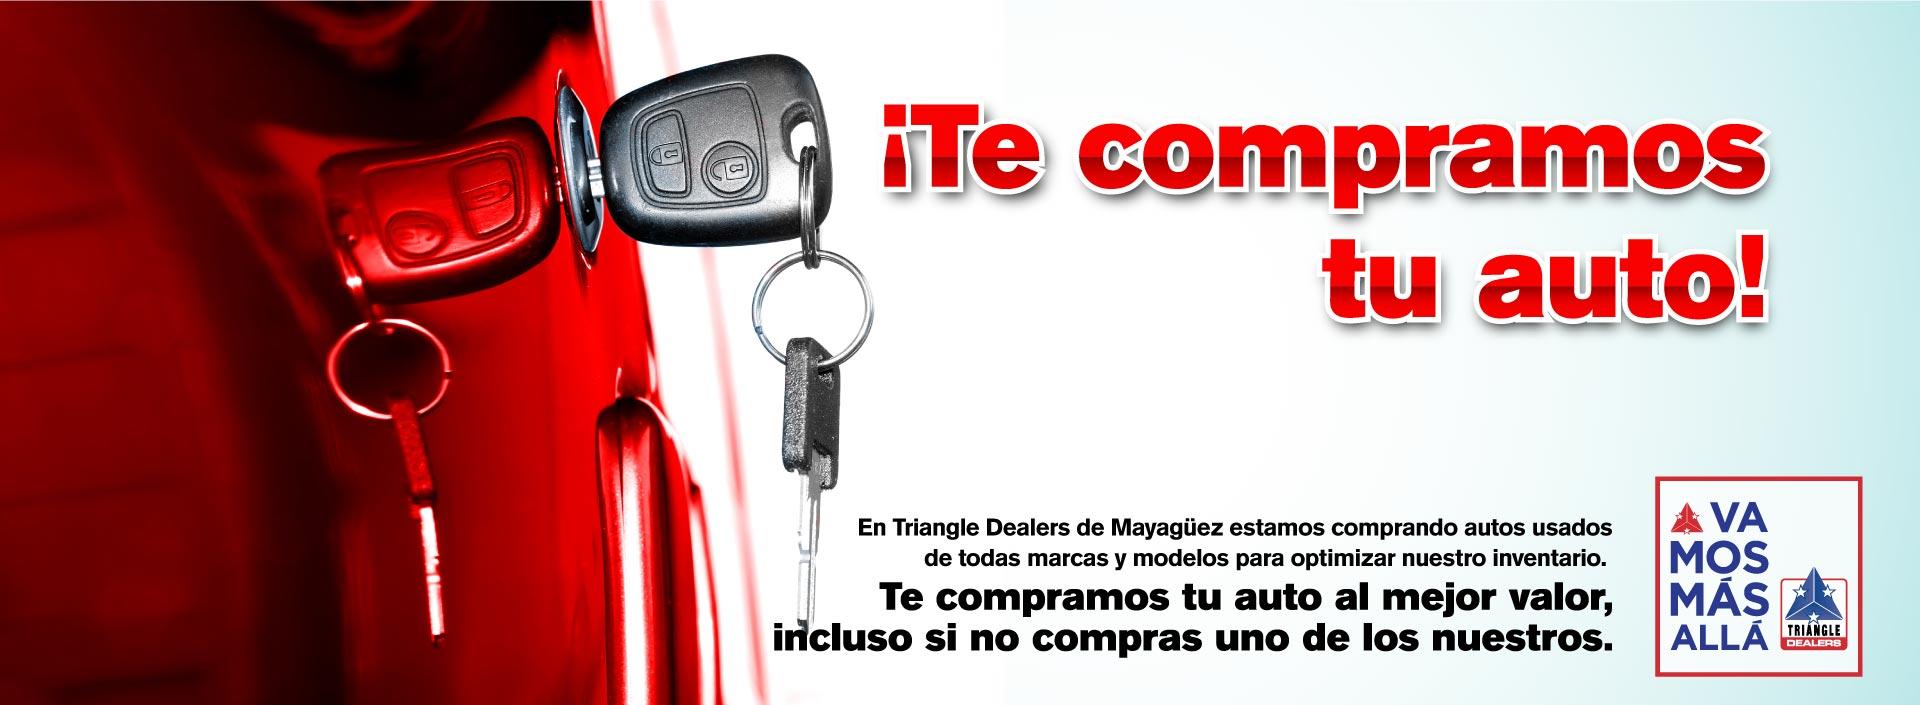 T.ChryslerOeste_Compramos_1920x705-Español